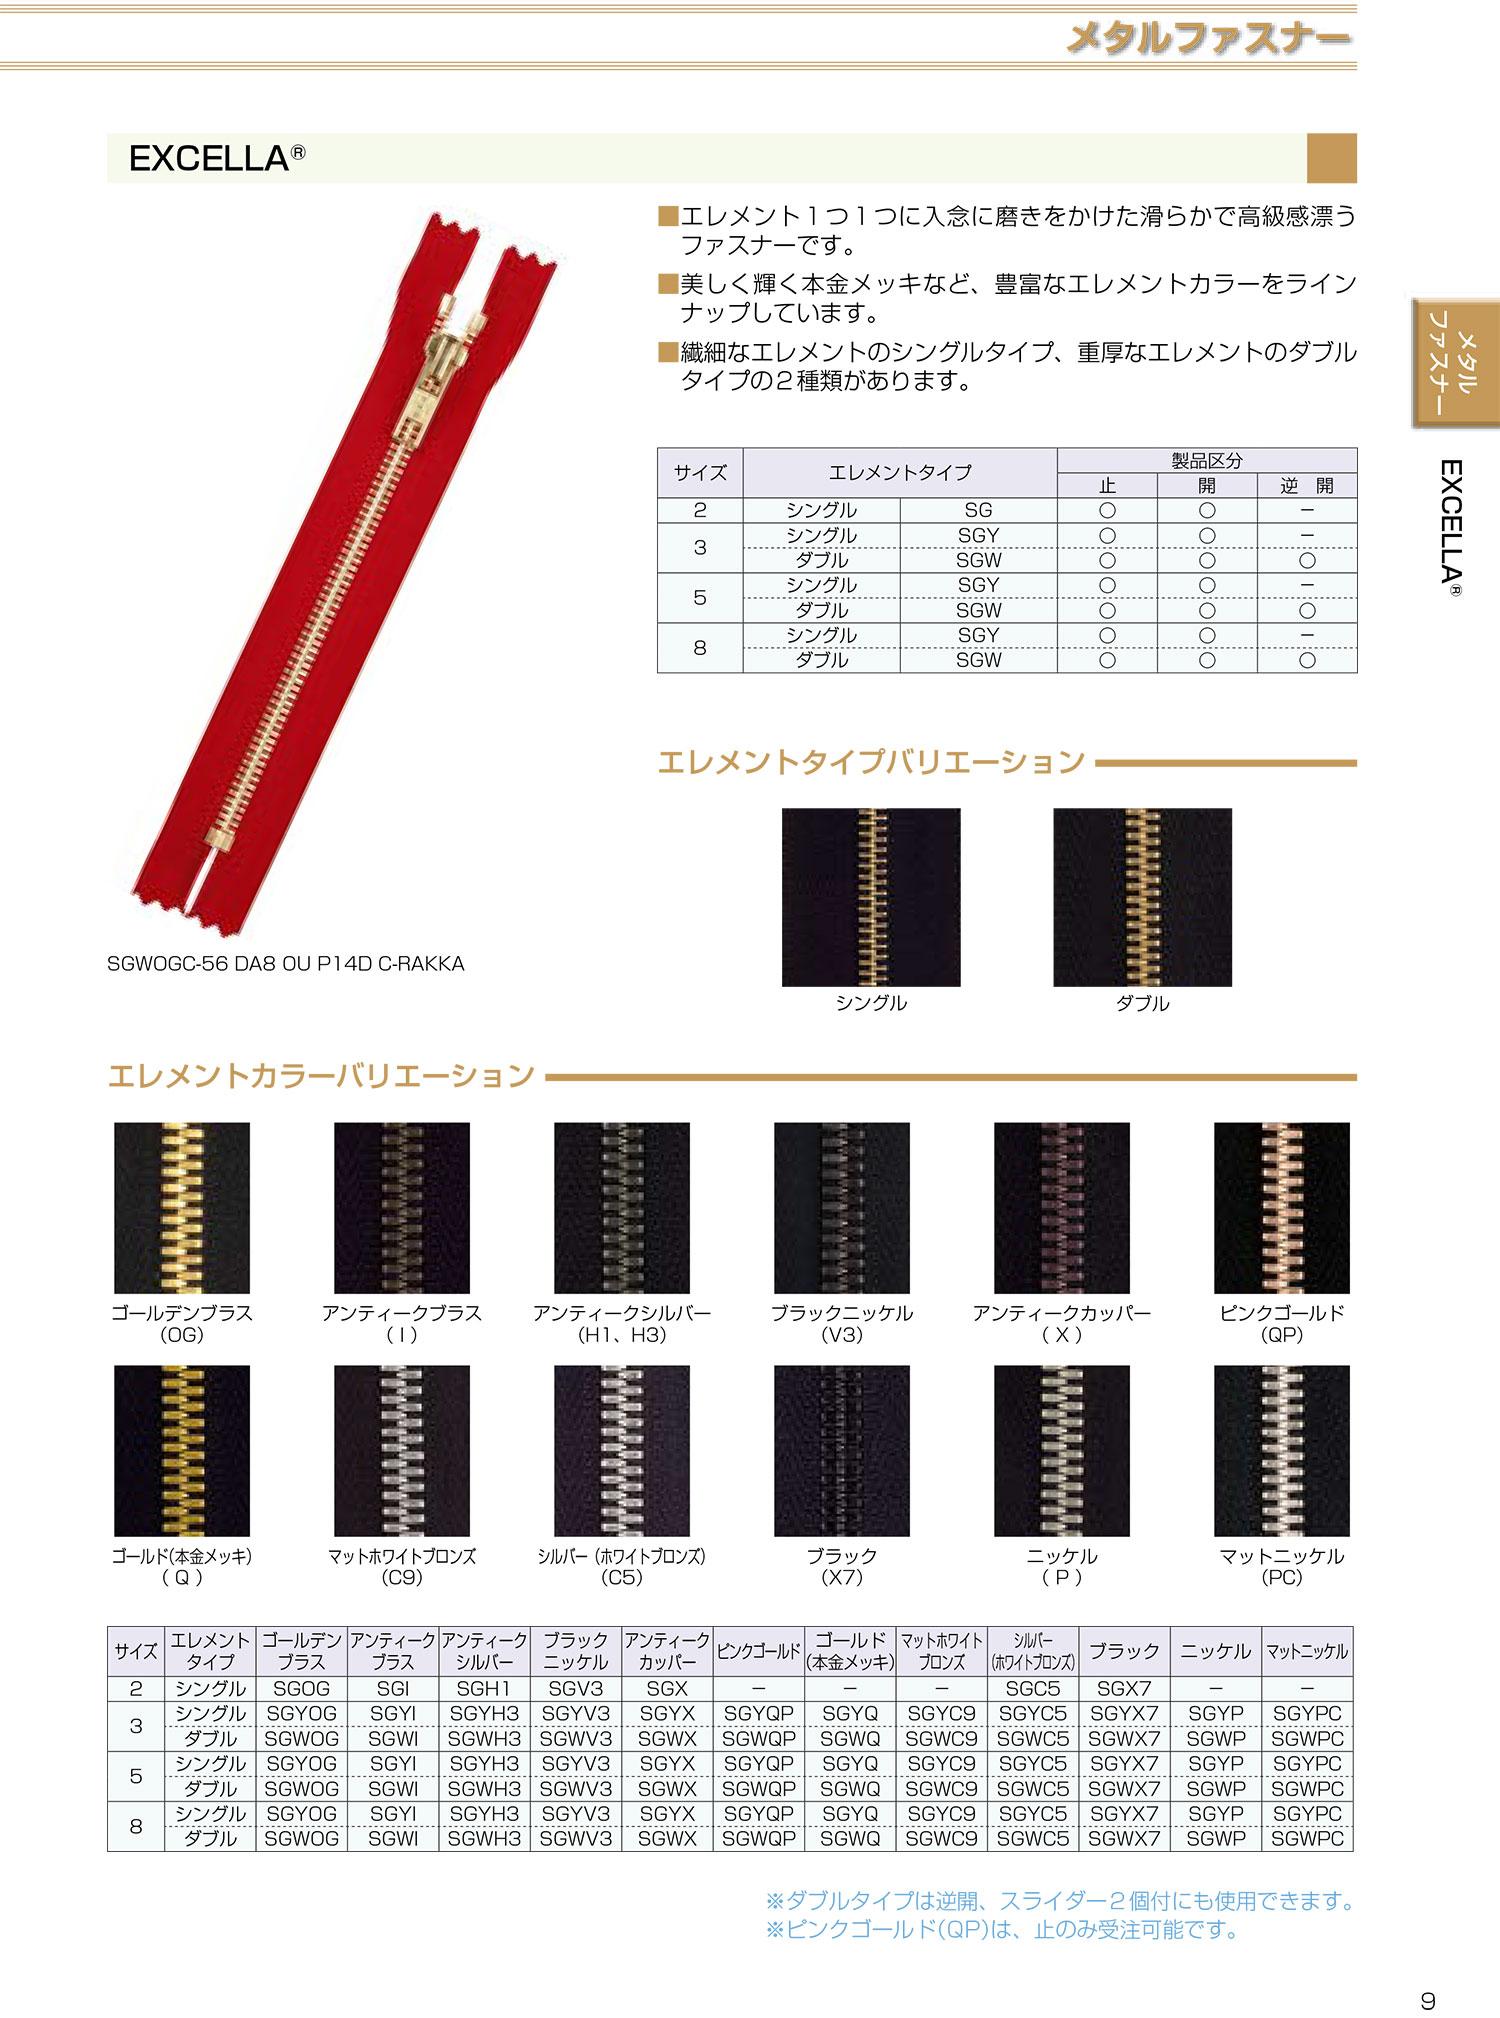 2SGH1OR エクセラ 2サイズ アンティークシルバー オープン シングル[ファスナー] YKK/オークラ商事 - ApparelX アパレル資材卸通販